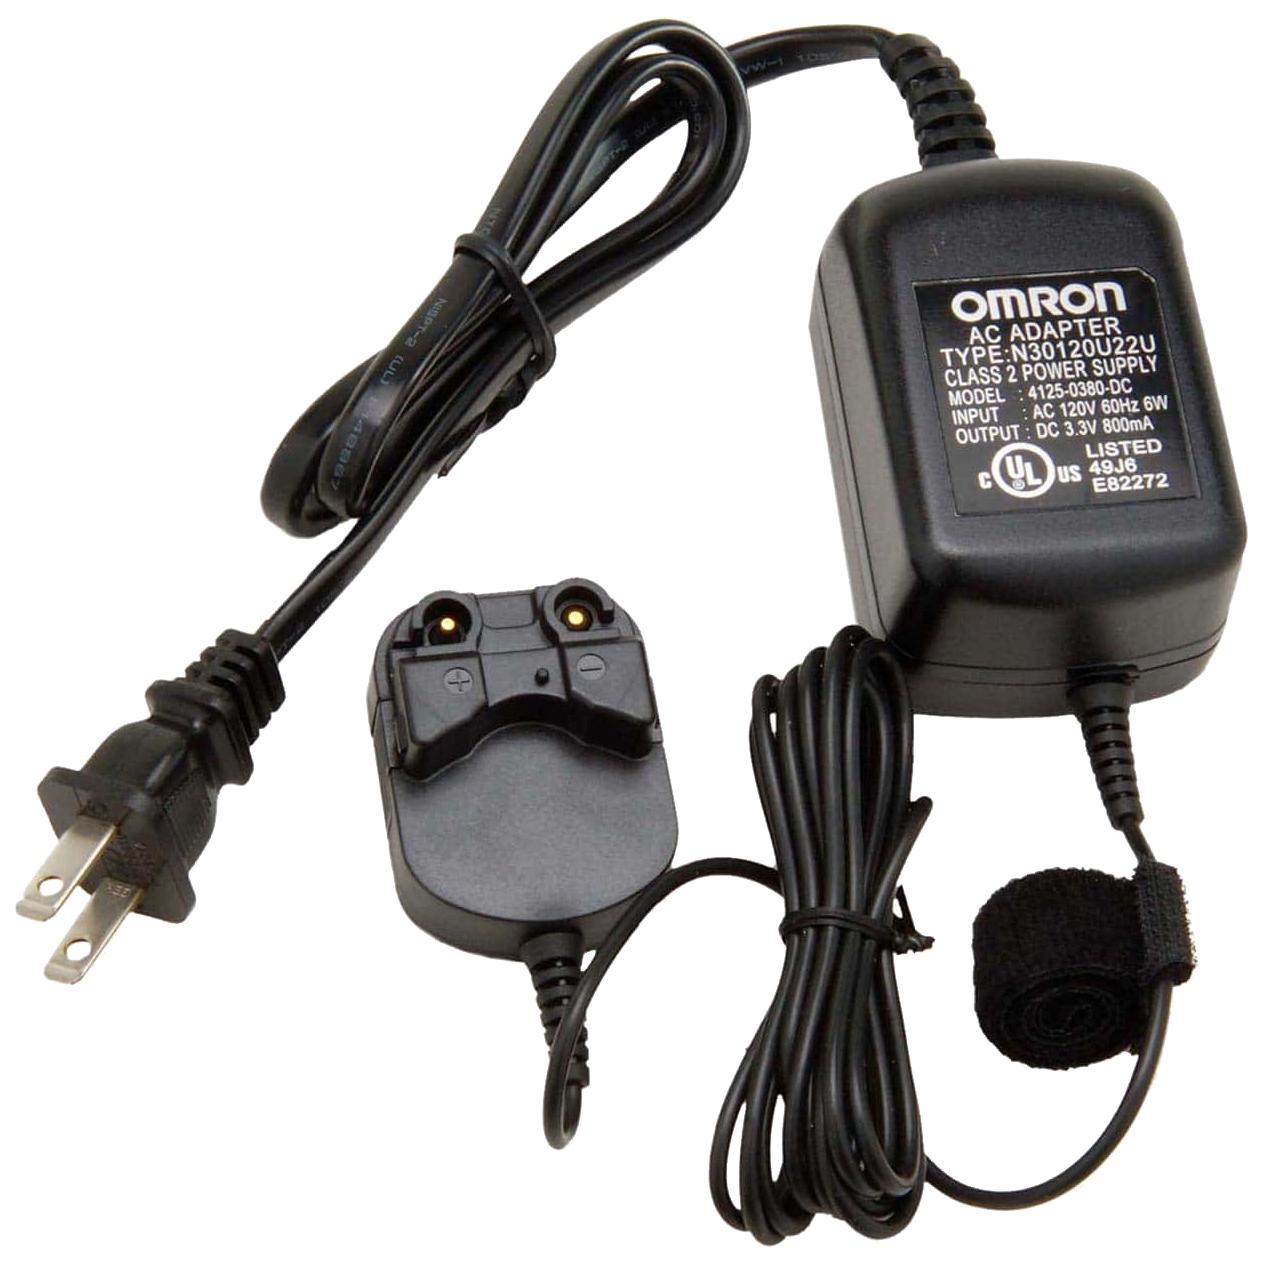 Сетевой адаптер для OMRON NE U22